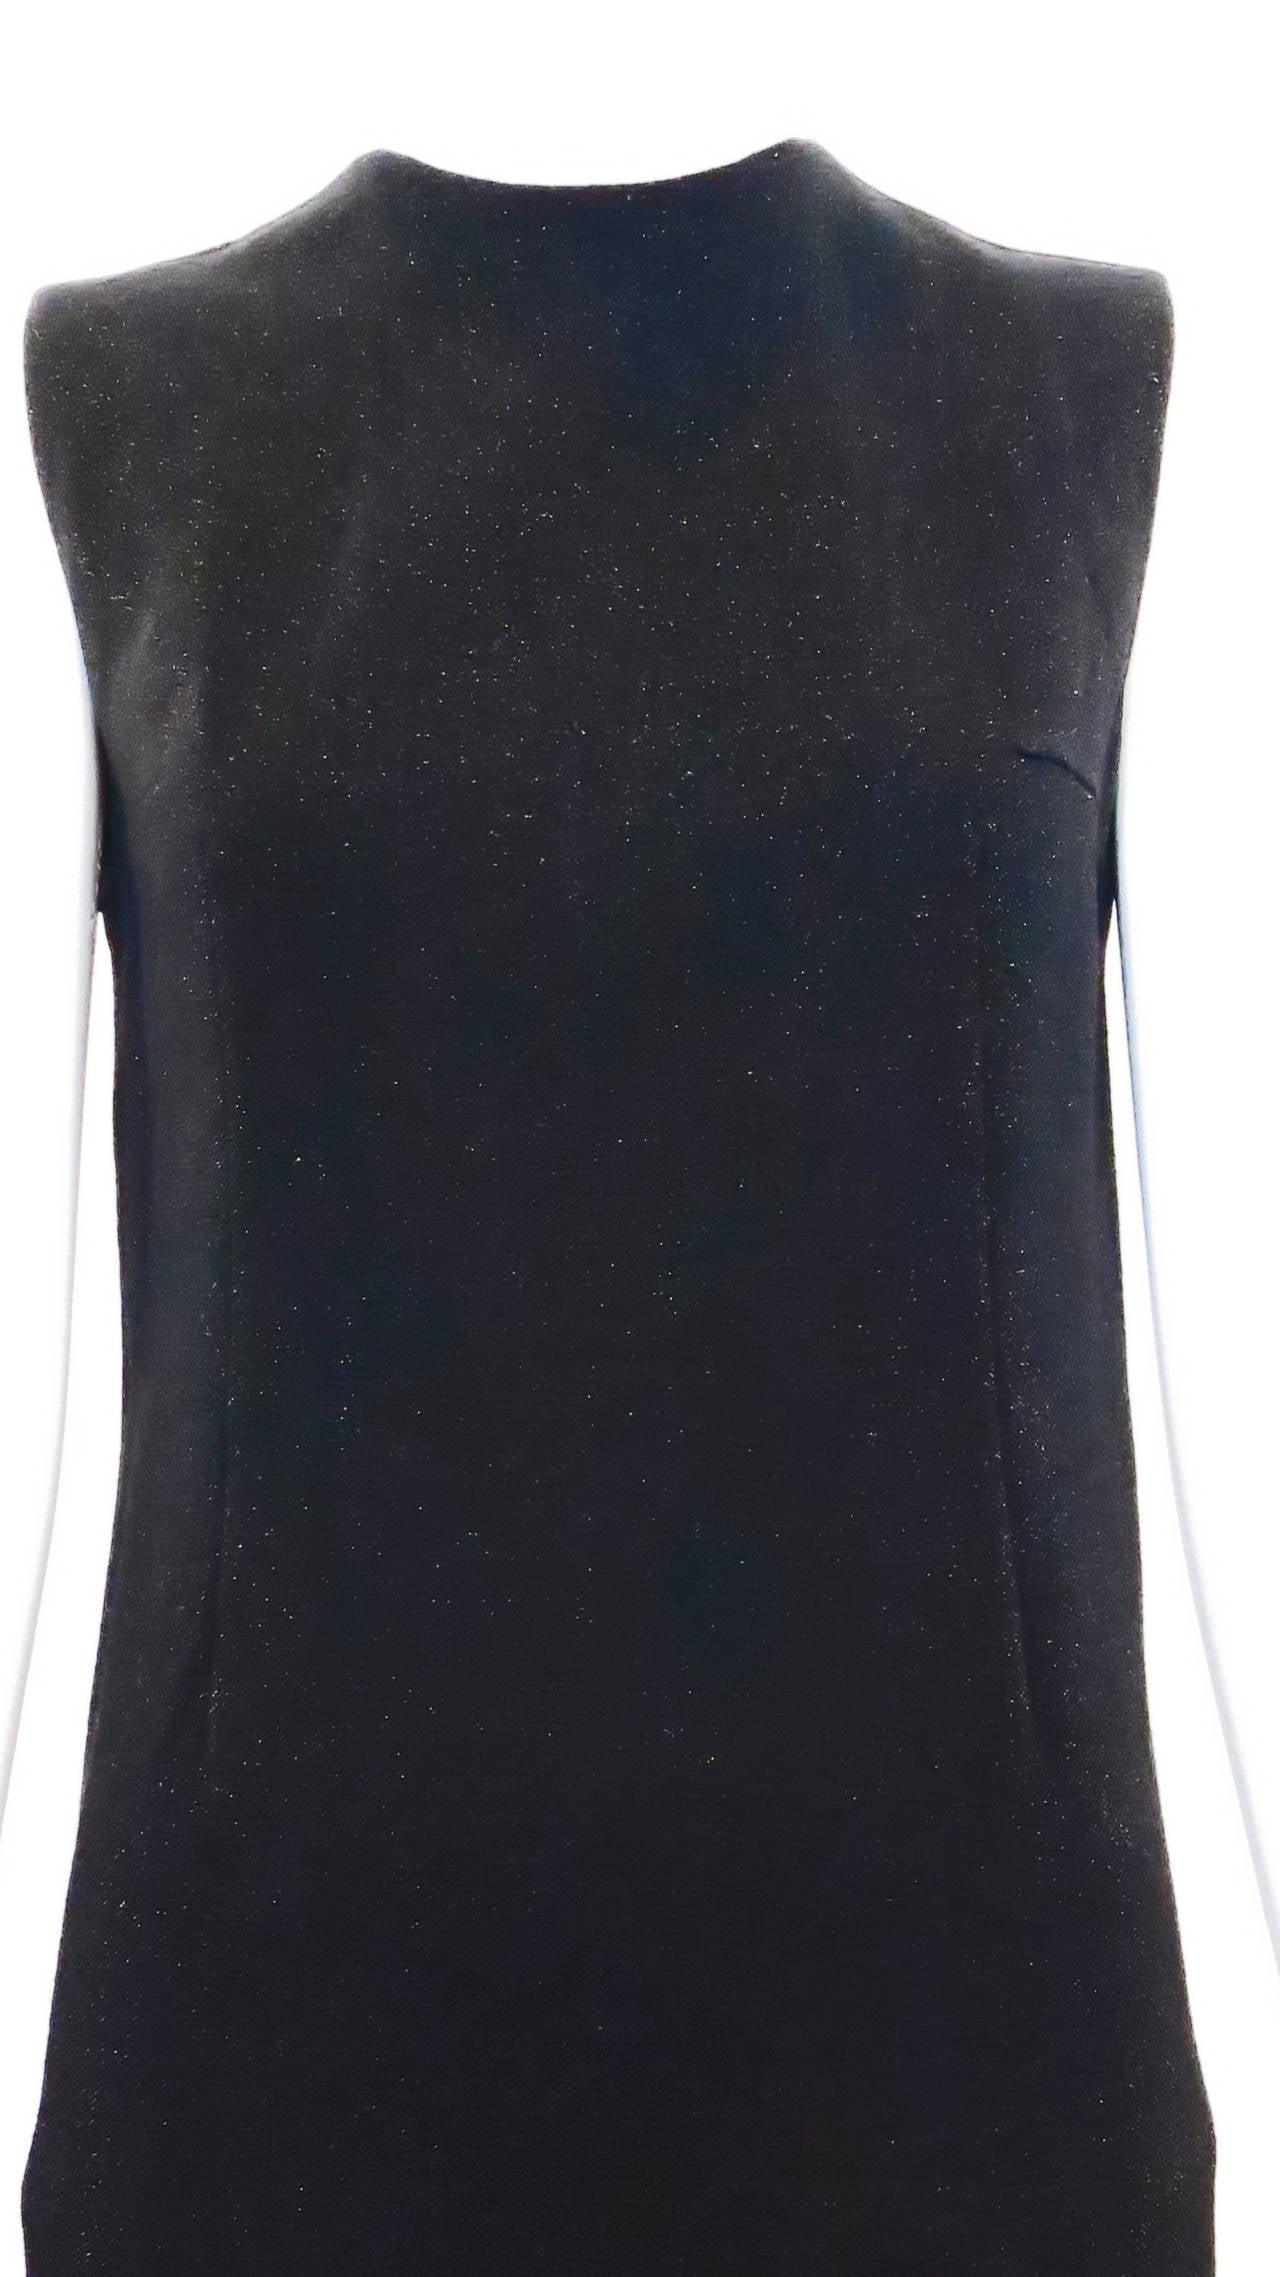 1970s Rudi Gernreich Shimmering Black Knit Dress 2